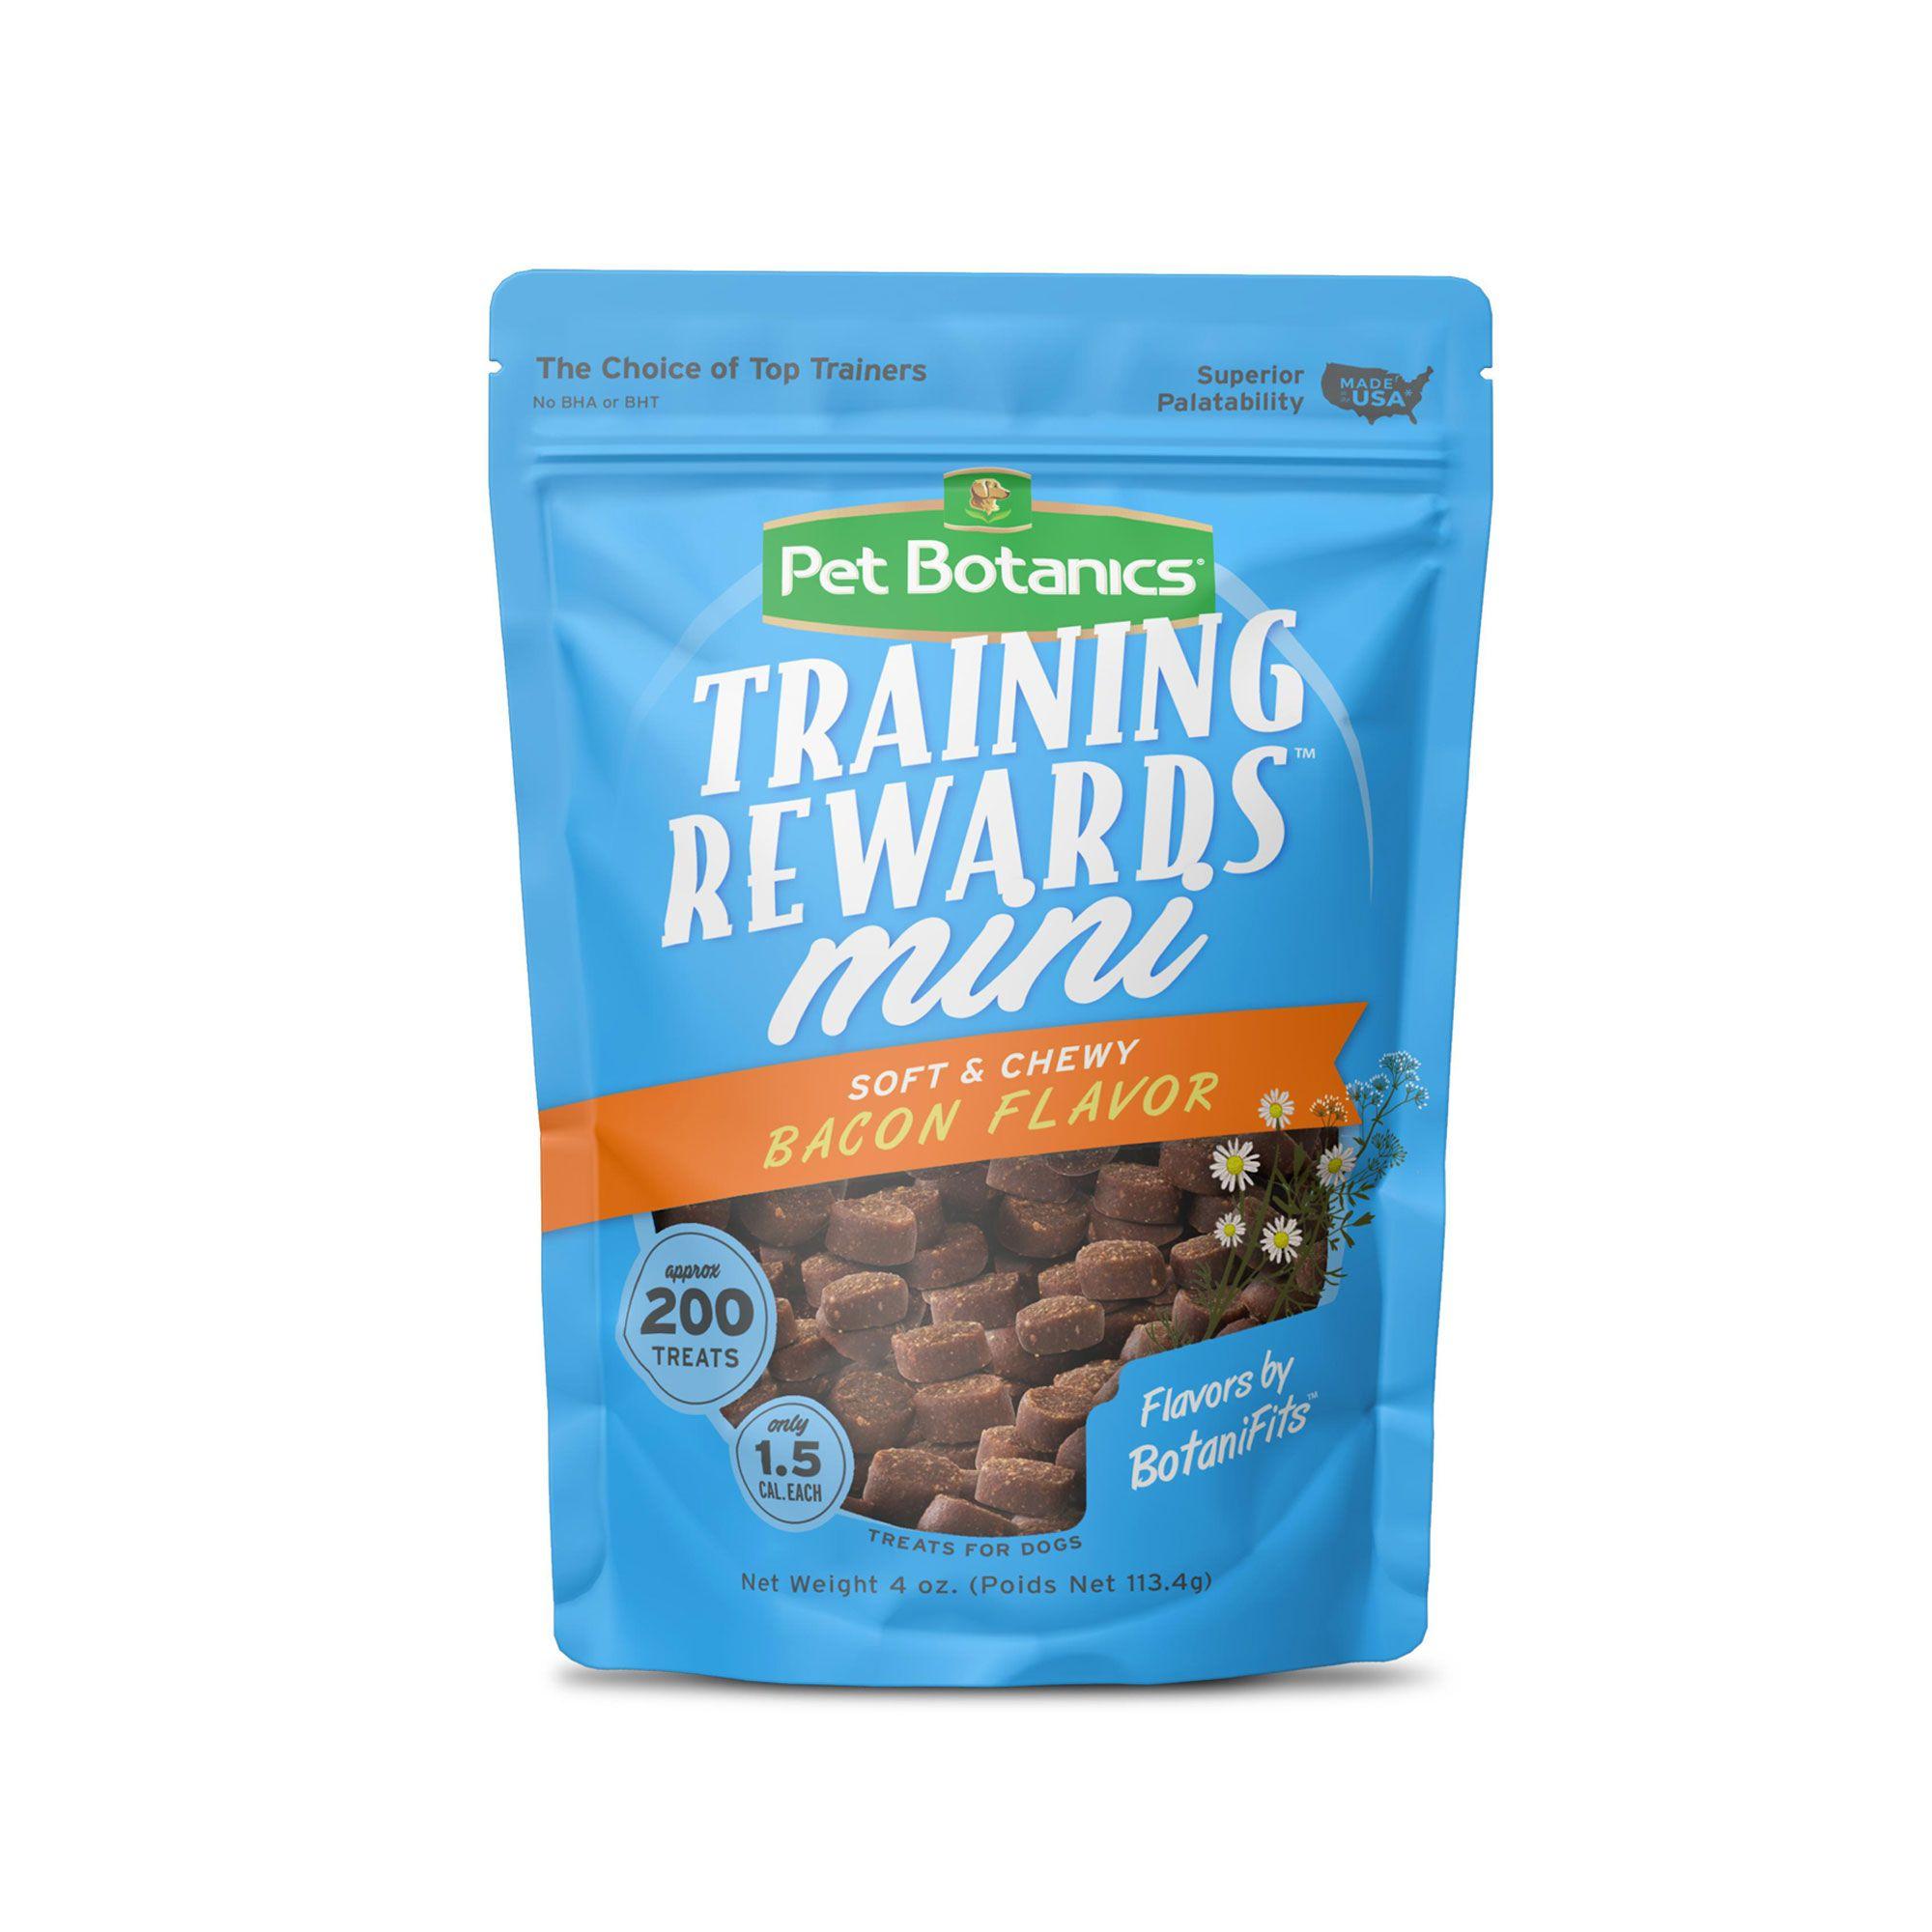 Pet Botanics Bacon Mini Training Reward Dog Treat size: 10 Oz, Real Bacon, Soft and Moist, Puppy and Adult Dogs, Pork Liver 5238817